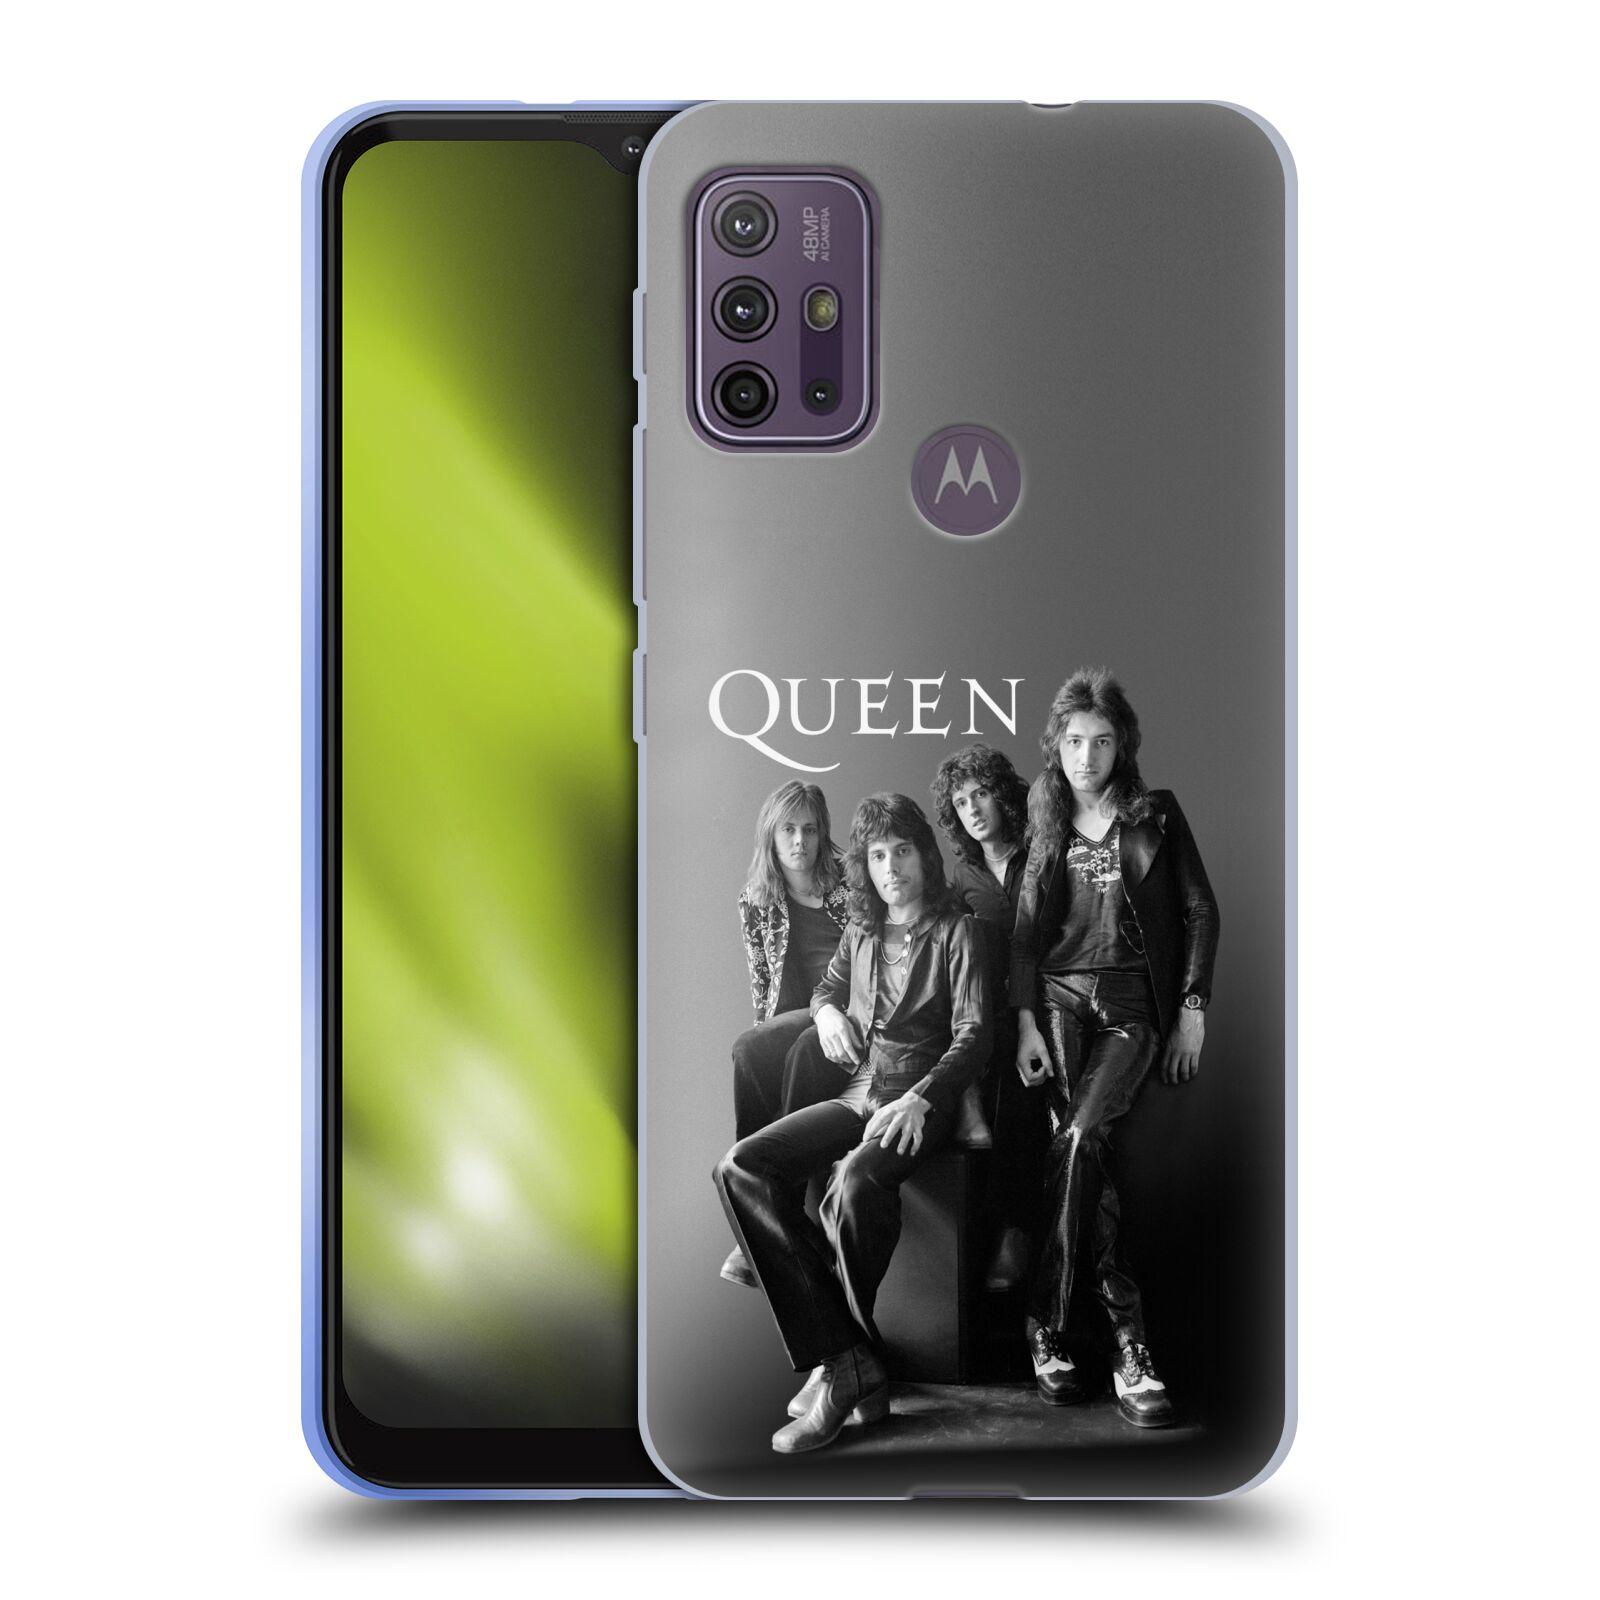 Silikonové pouzdro na mobil Motorola Moto G10 / G30 - Head Case - Queen - Skupina